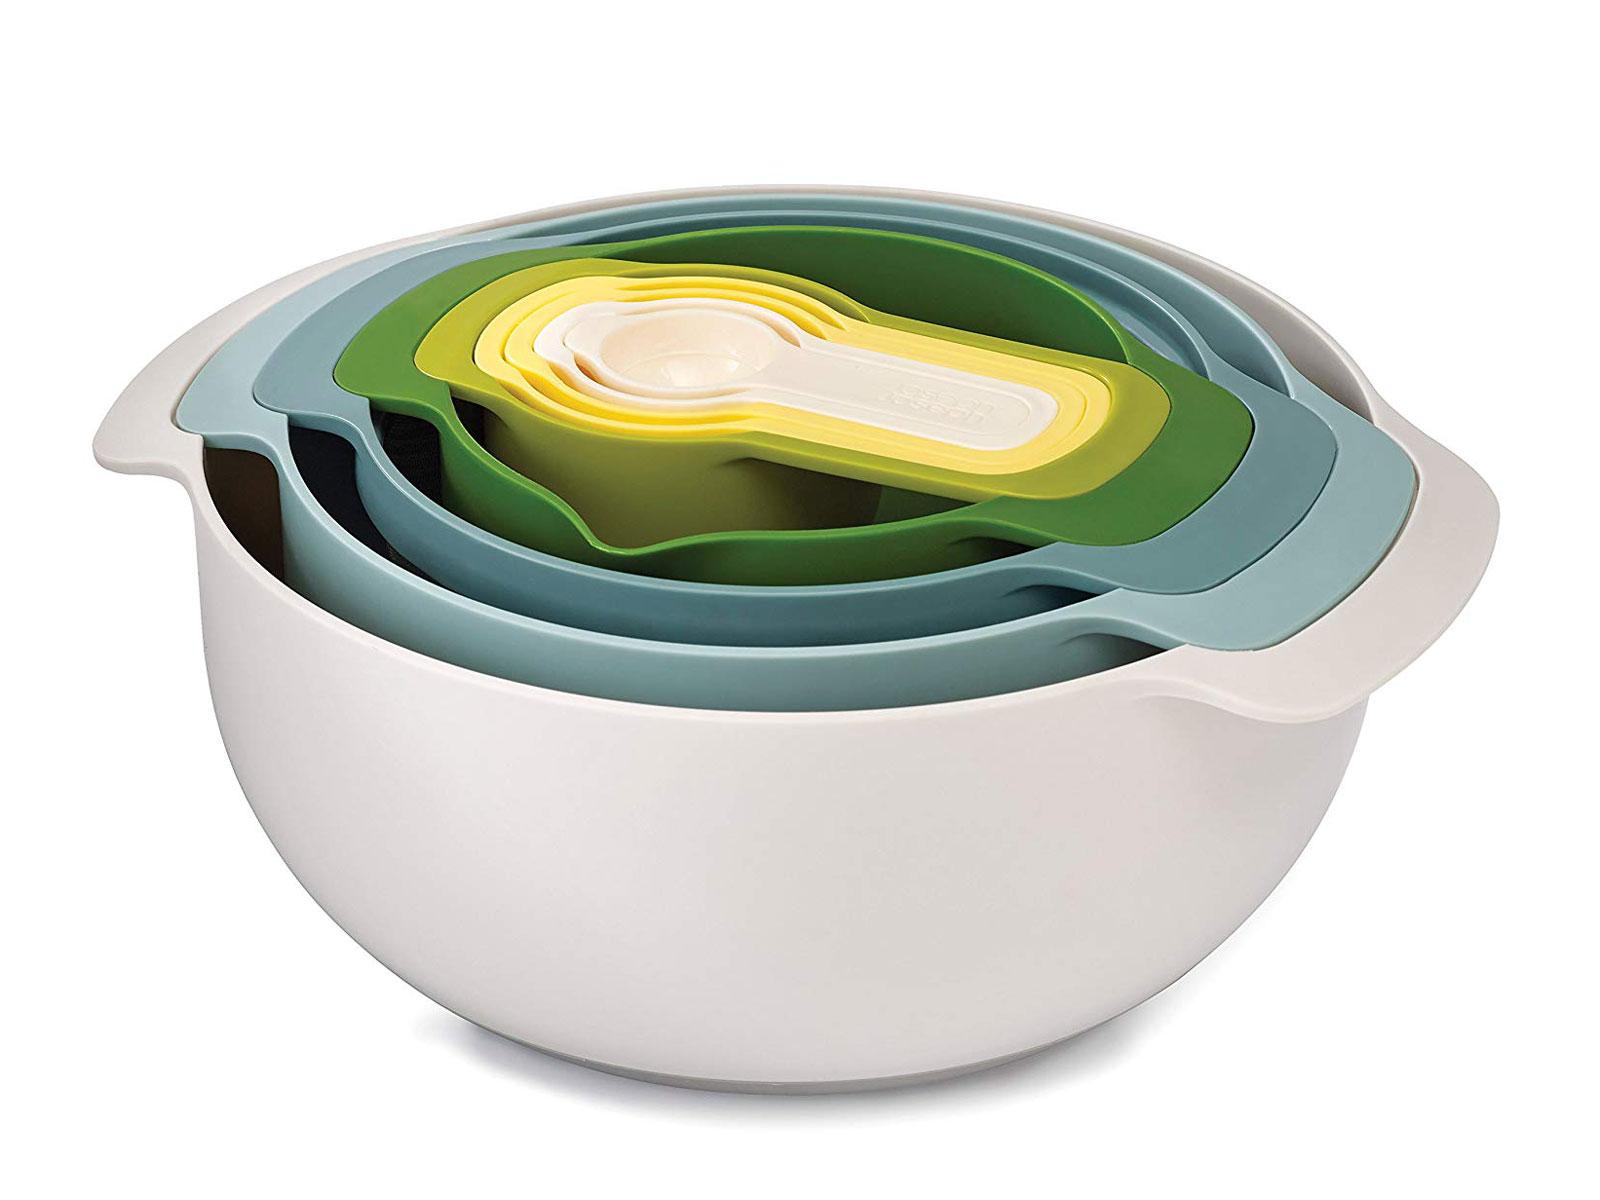 Stackable Kitchen Bowls